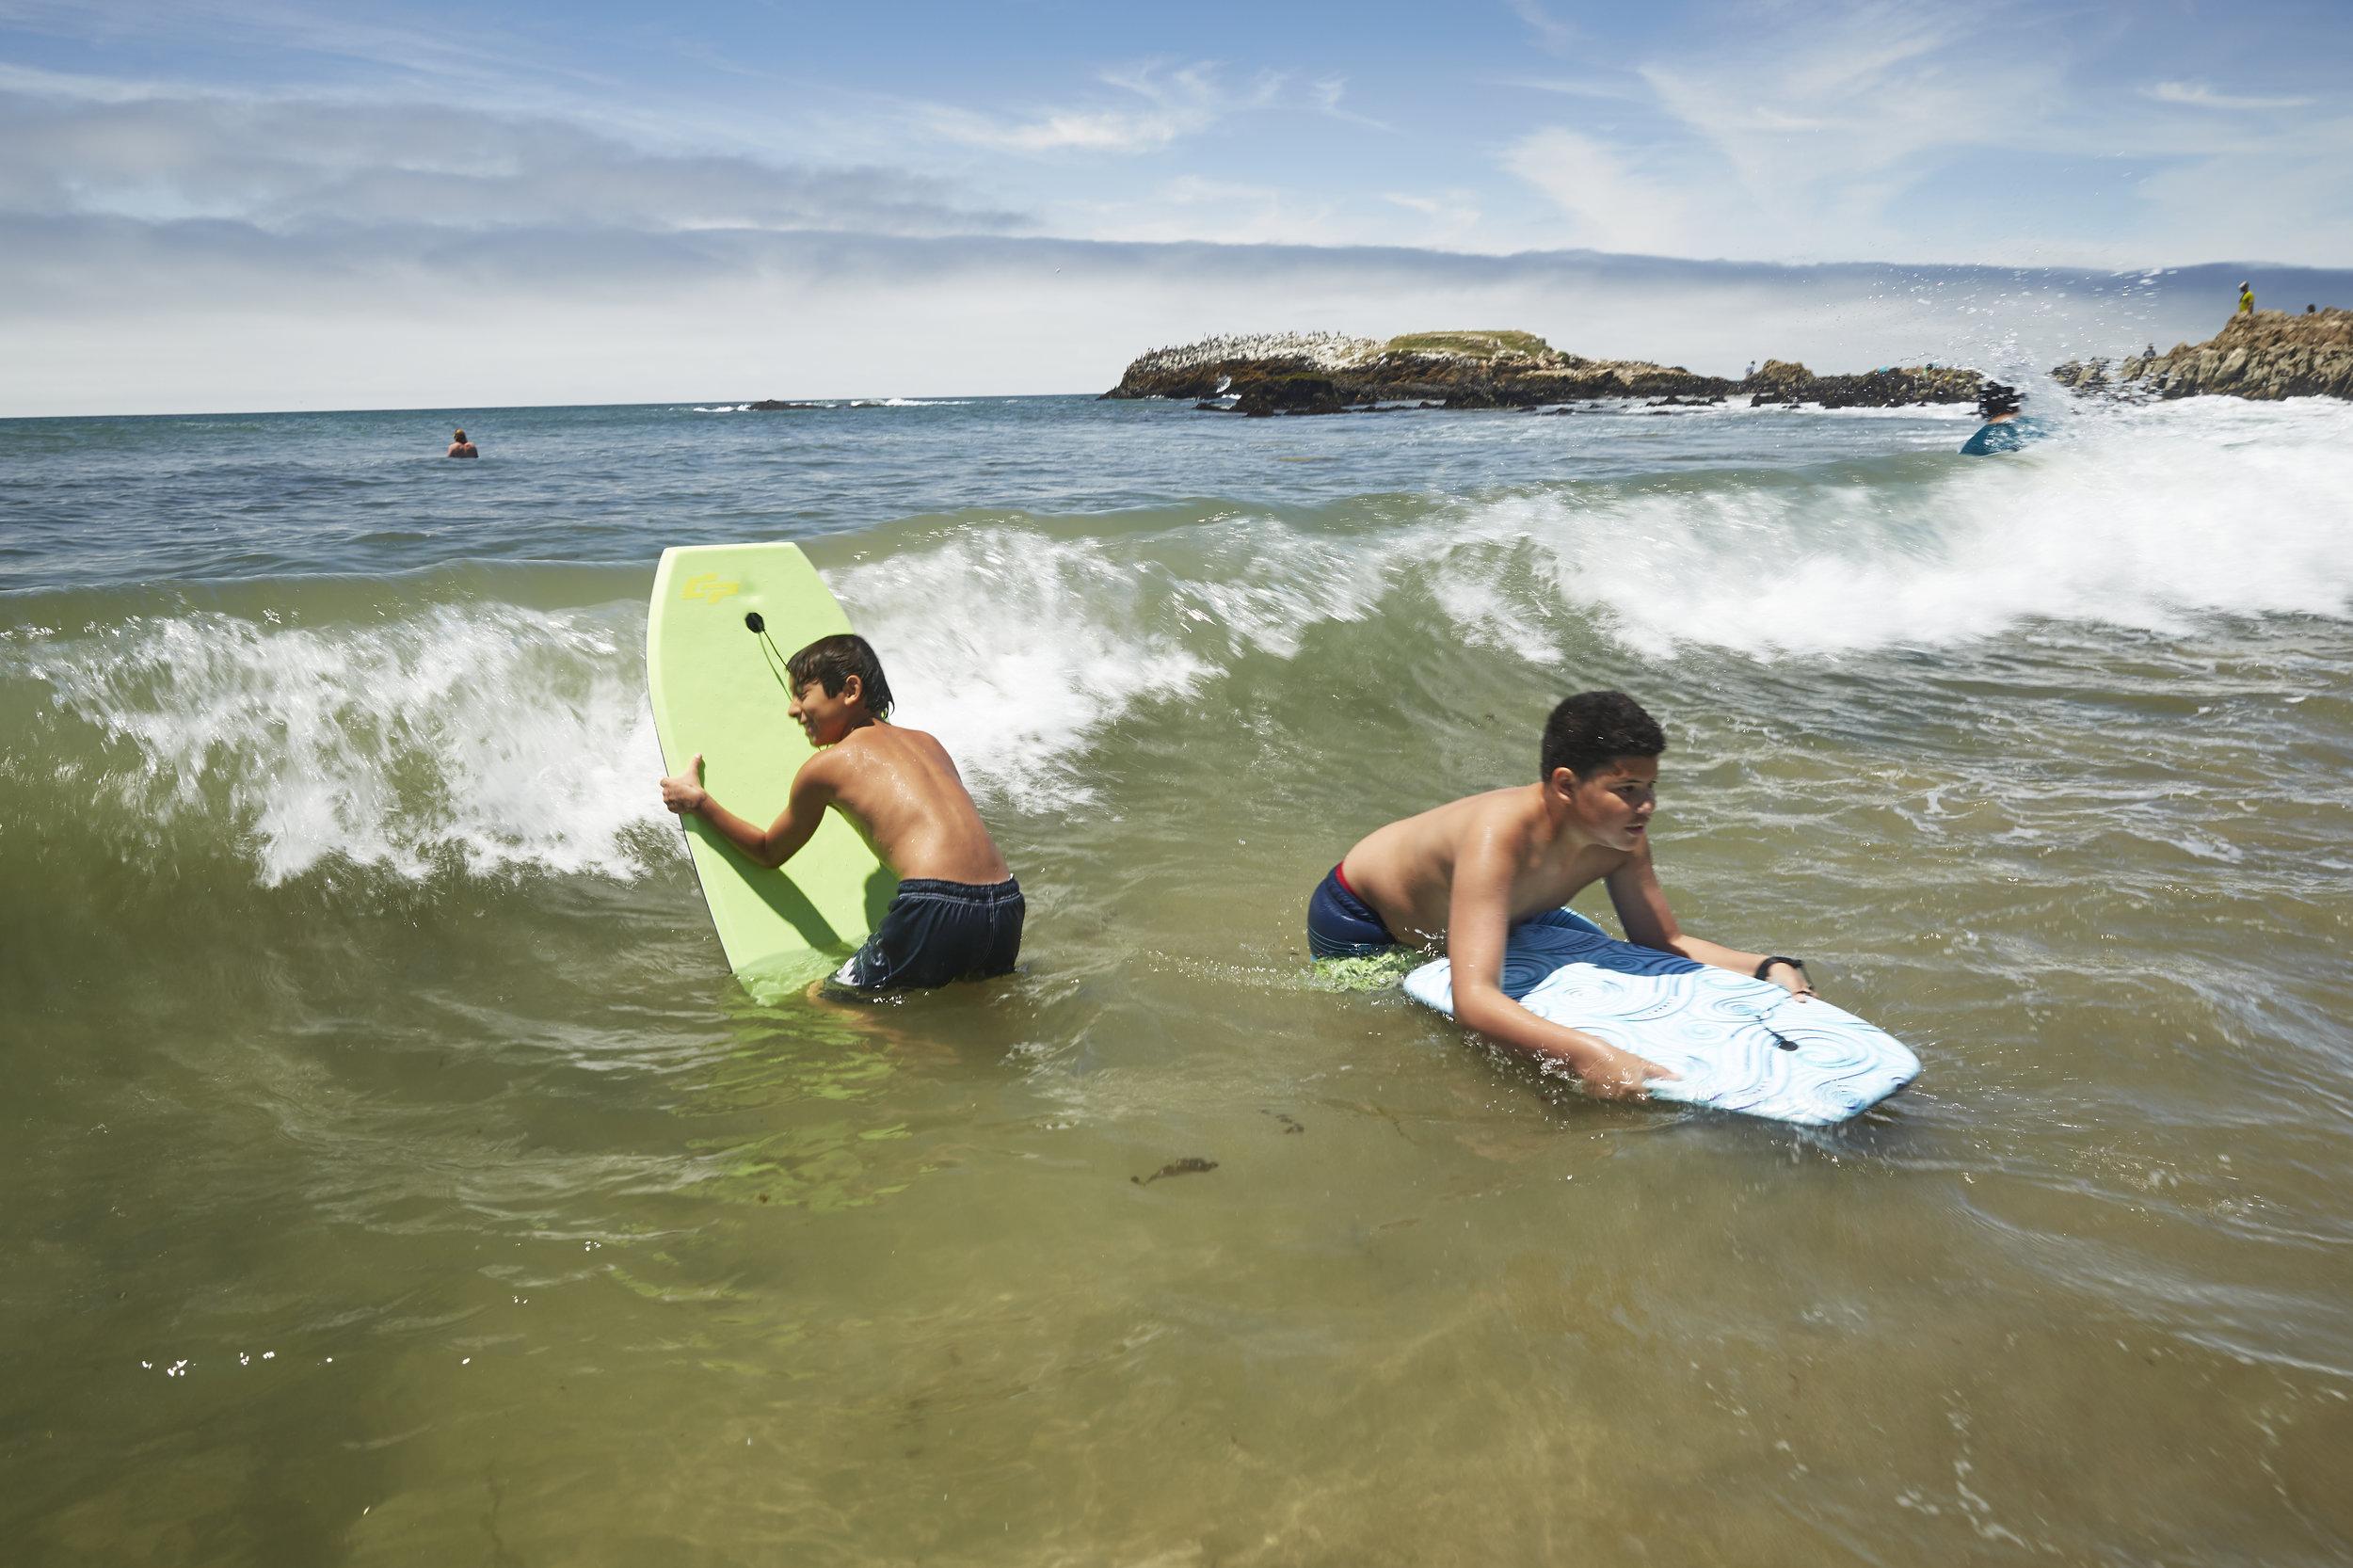 Amah Mutsun youth boogie boarding during summer camp beach day. Photo curtesy of Rob Brodman